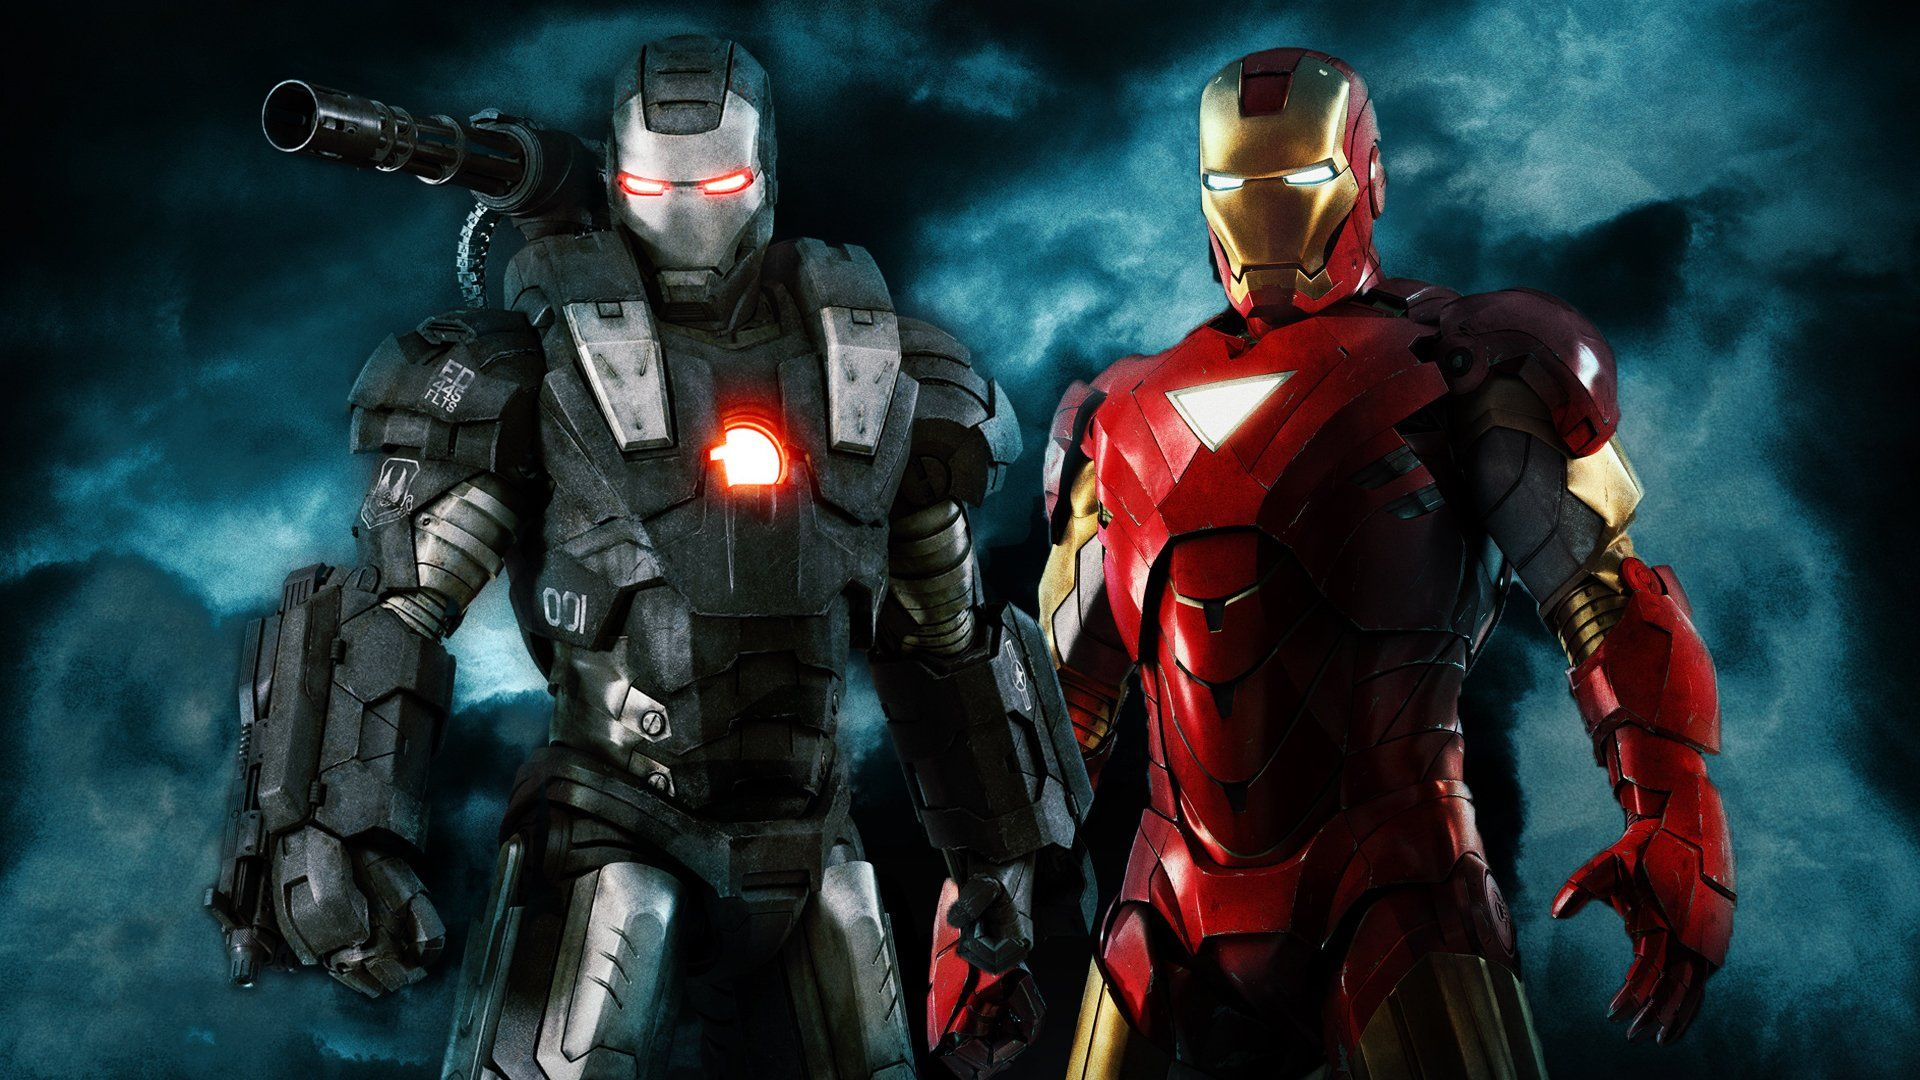 Iron Man 2 Wallpapers Top Free Iron Man 2 Backgrounds